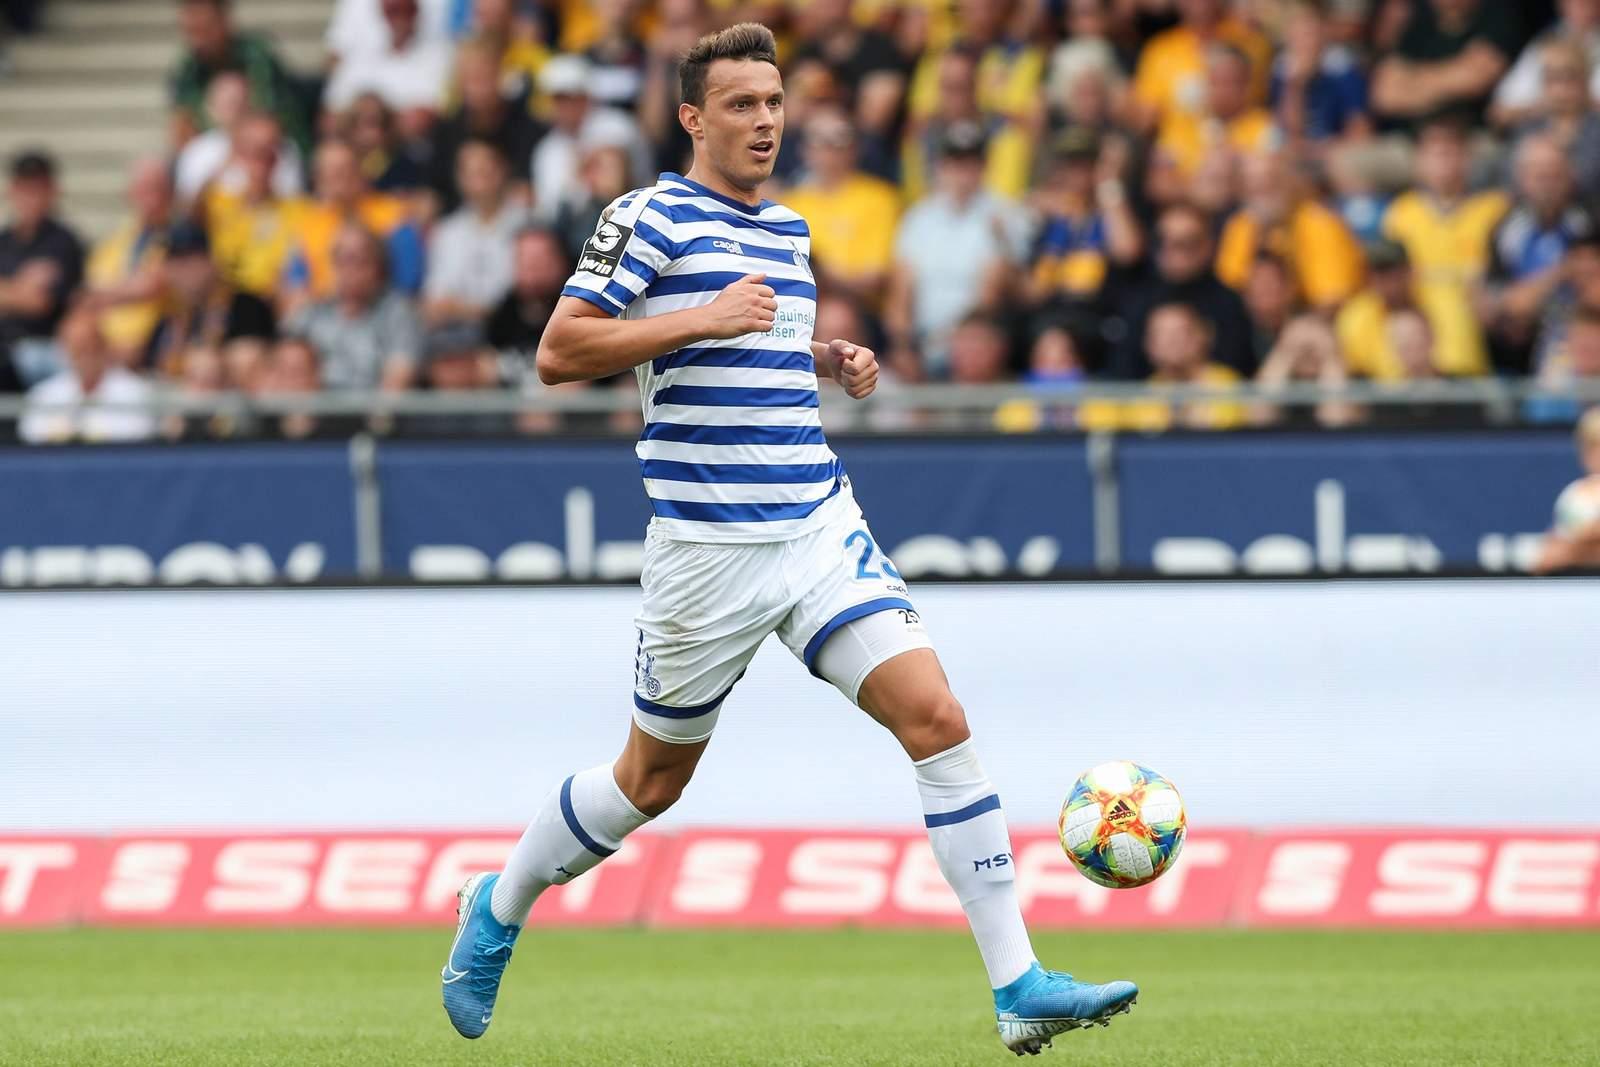 Petar Sliskovic vom MSV Duisburg